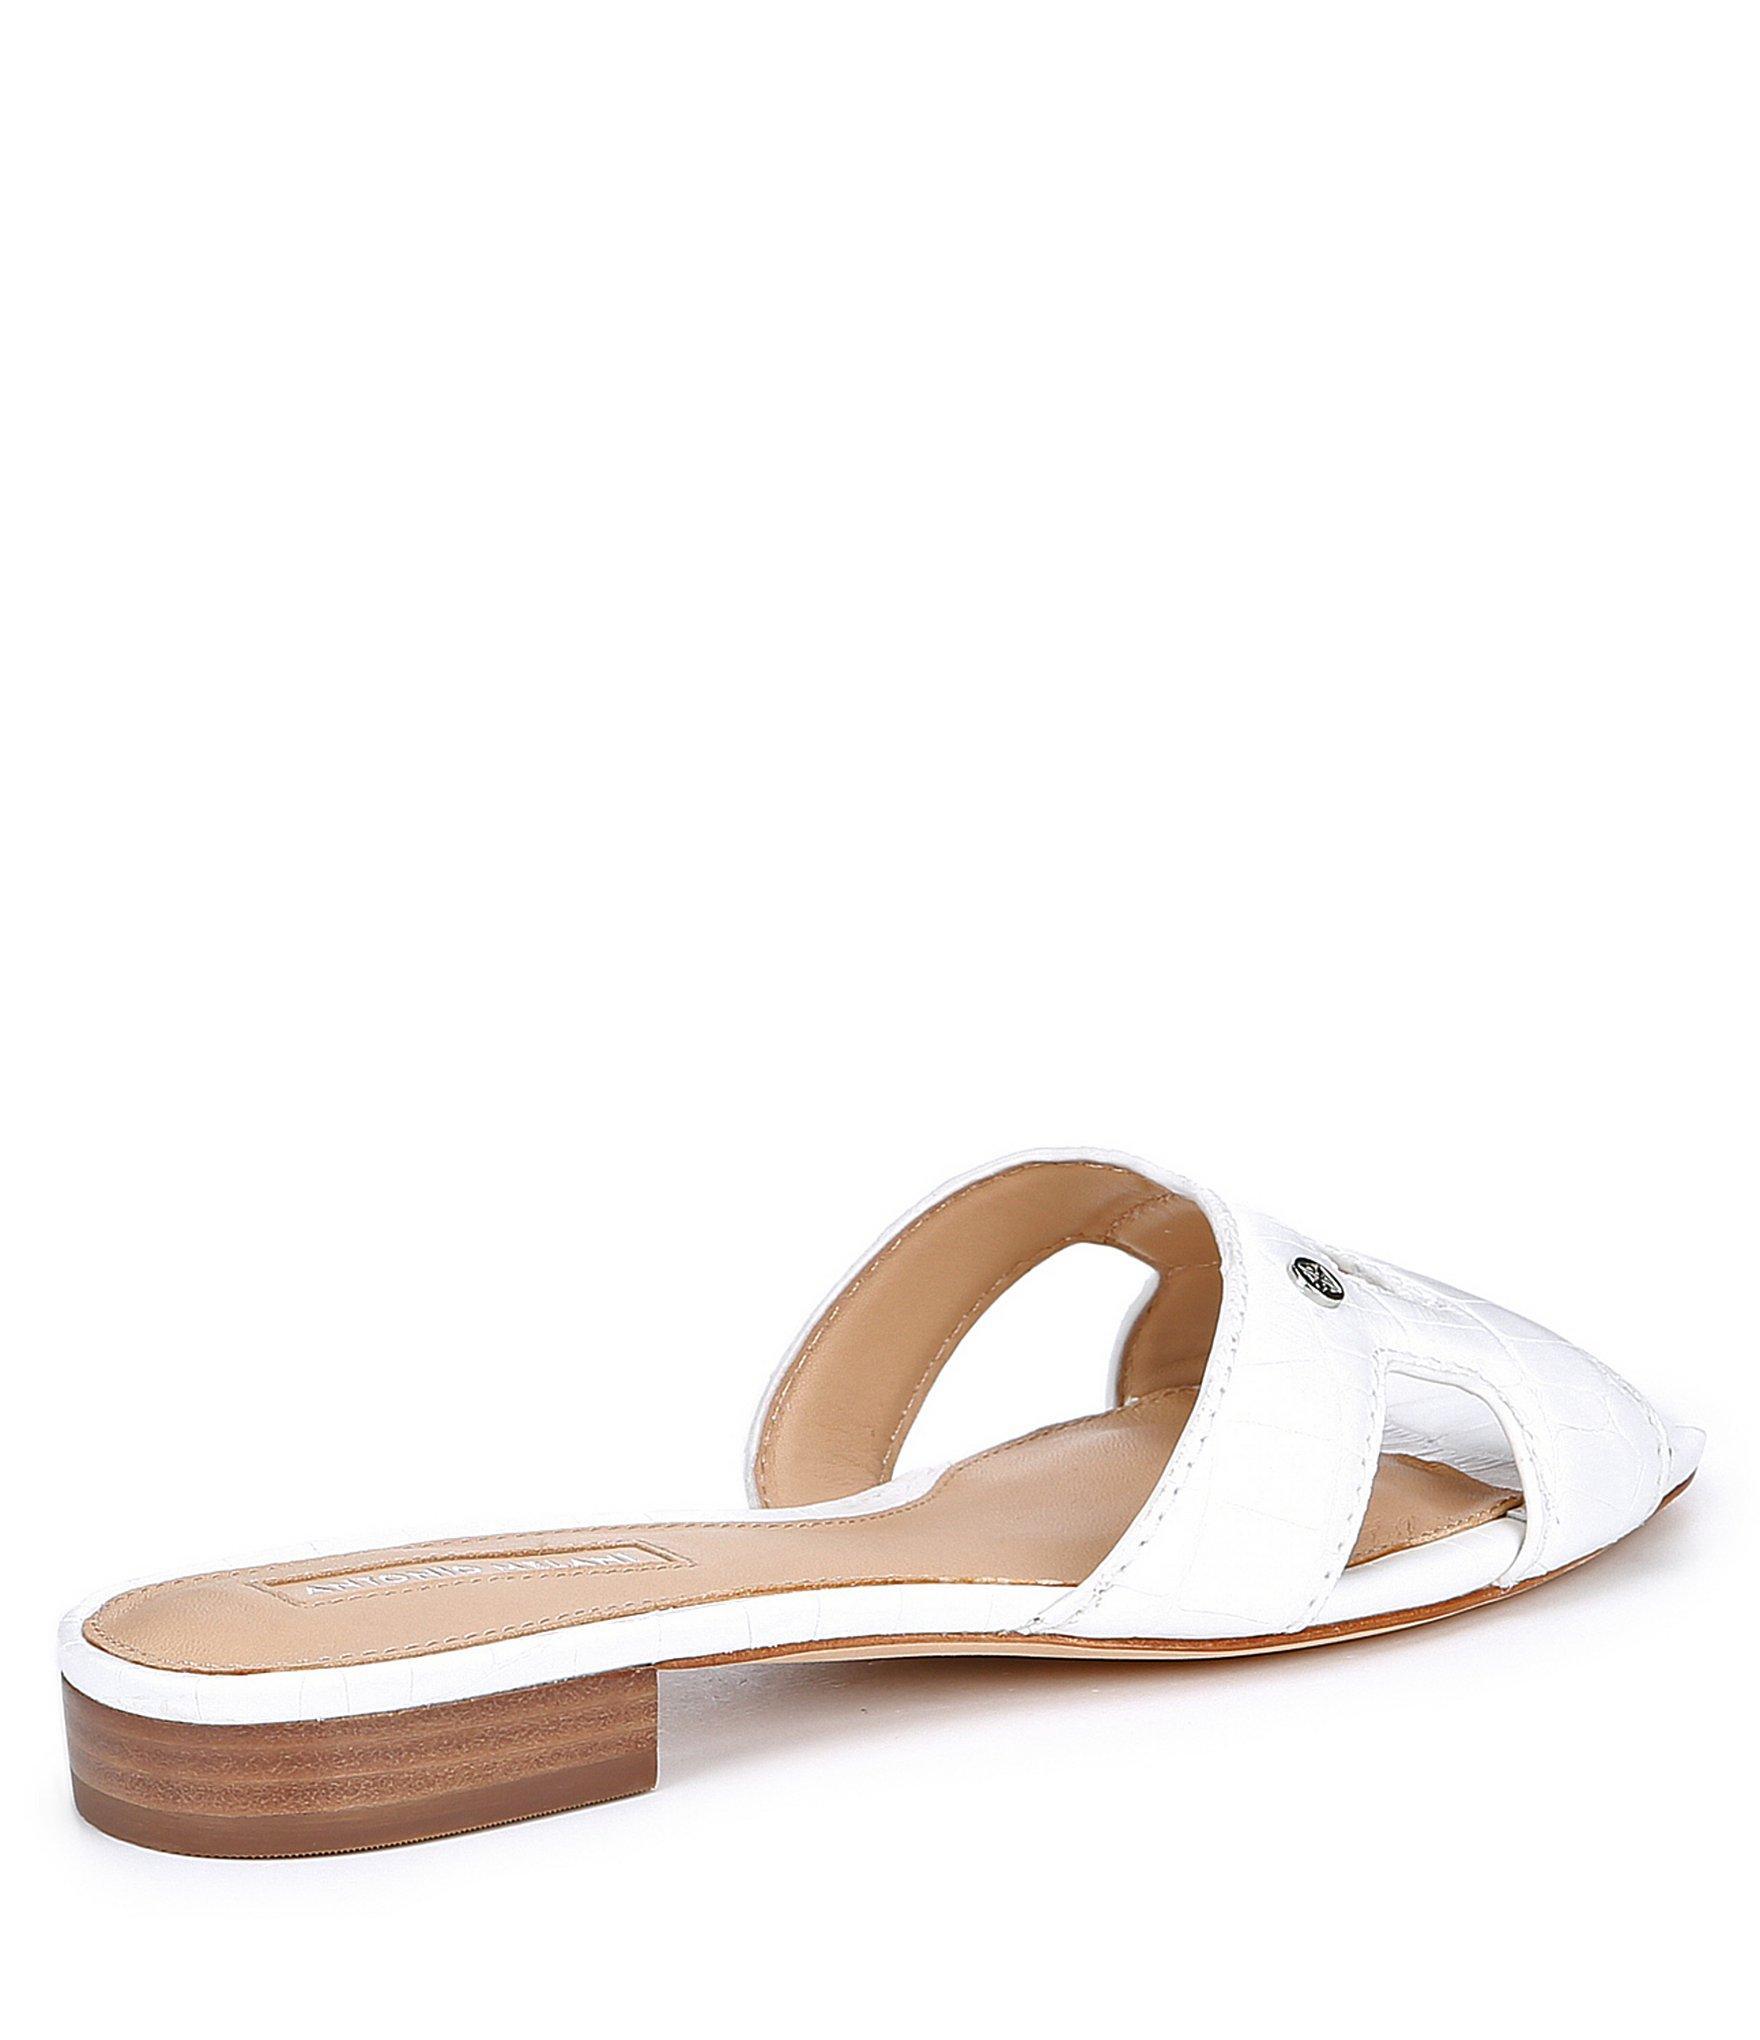 32bb01d64e6a61 Lyst - Antonio Melani Carrah Logo Slide Sandals in White